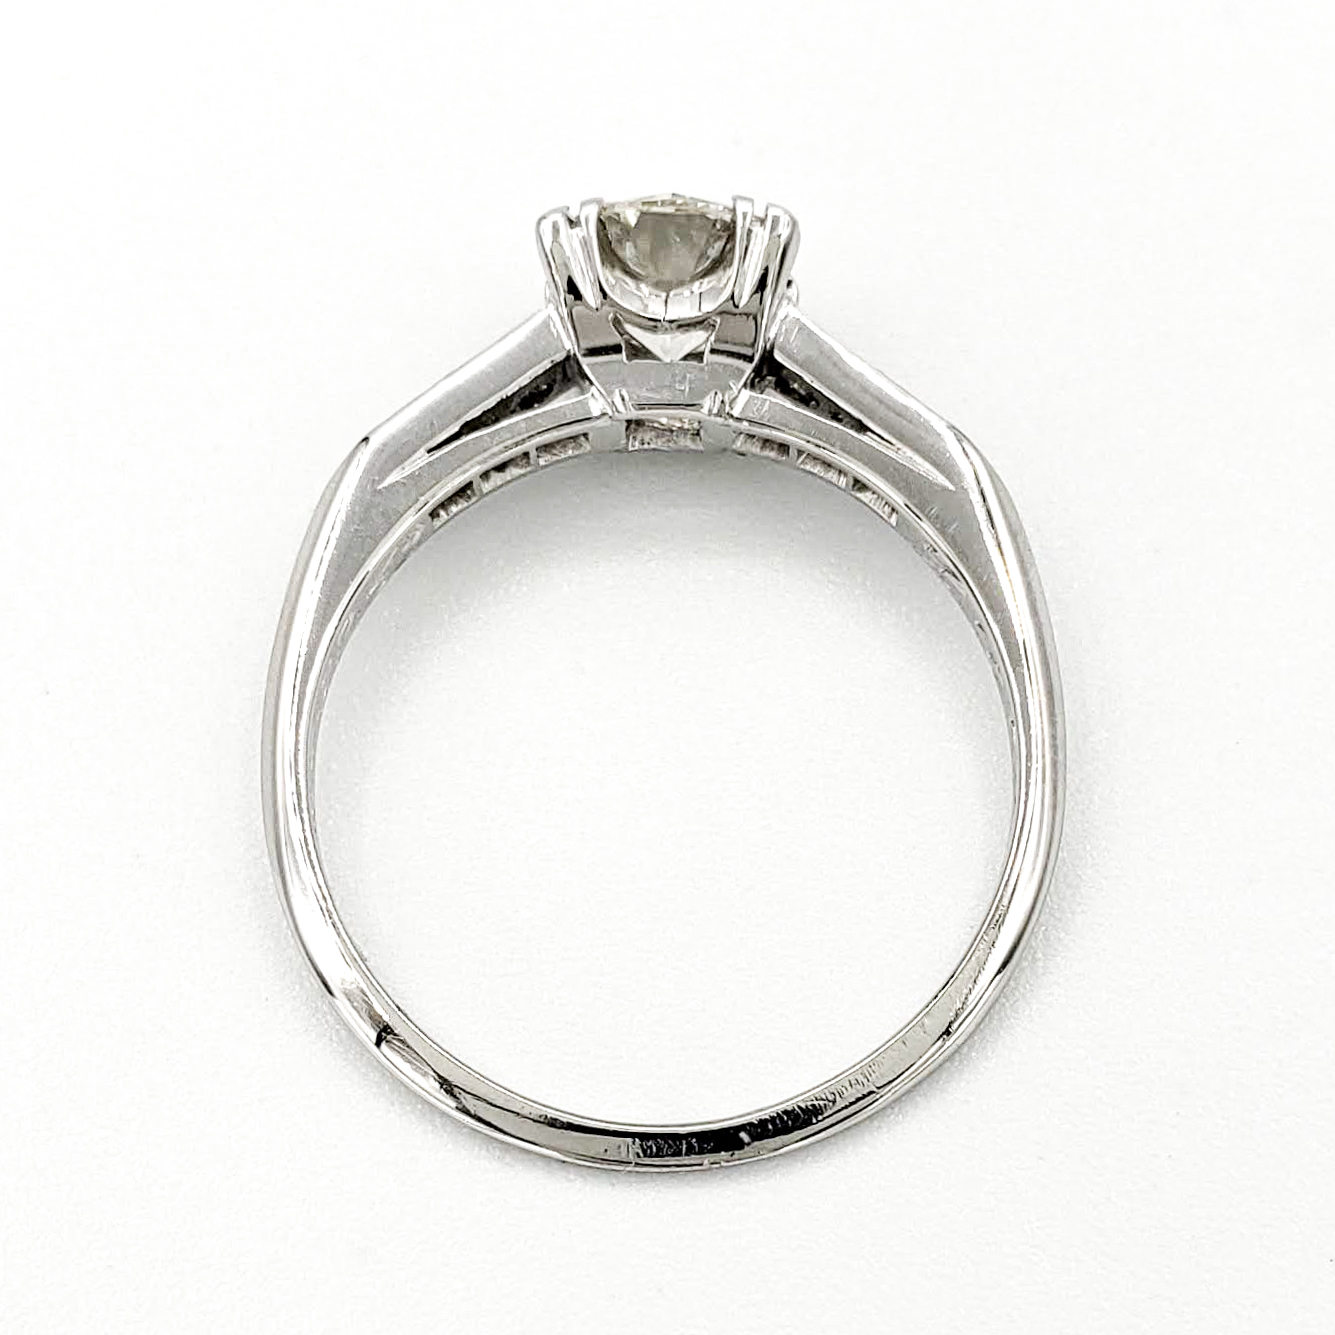 vintage-platinum-engagement-ring-with-0-68-carat-round-brilliant-cut-diamond-egl-j-vs1